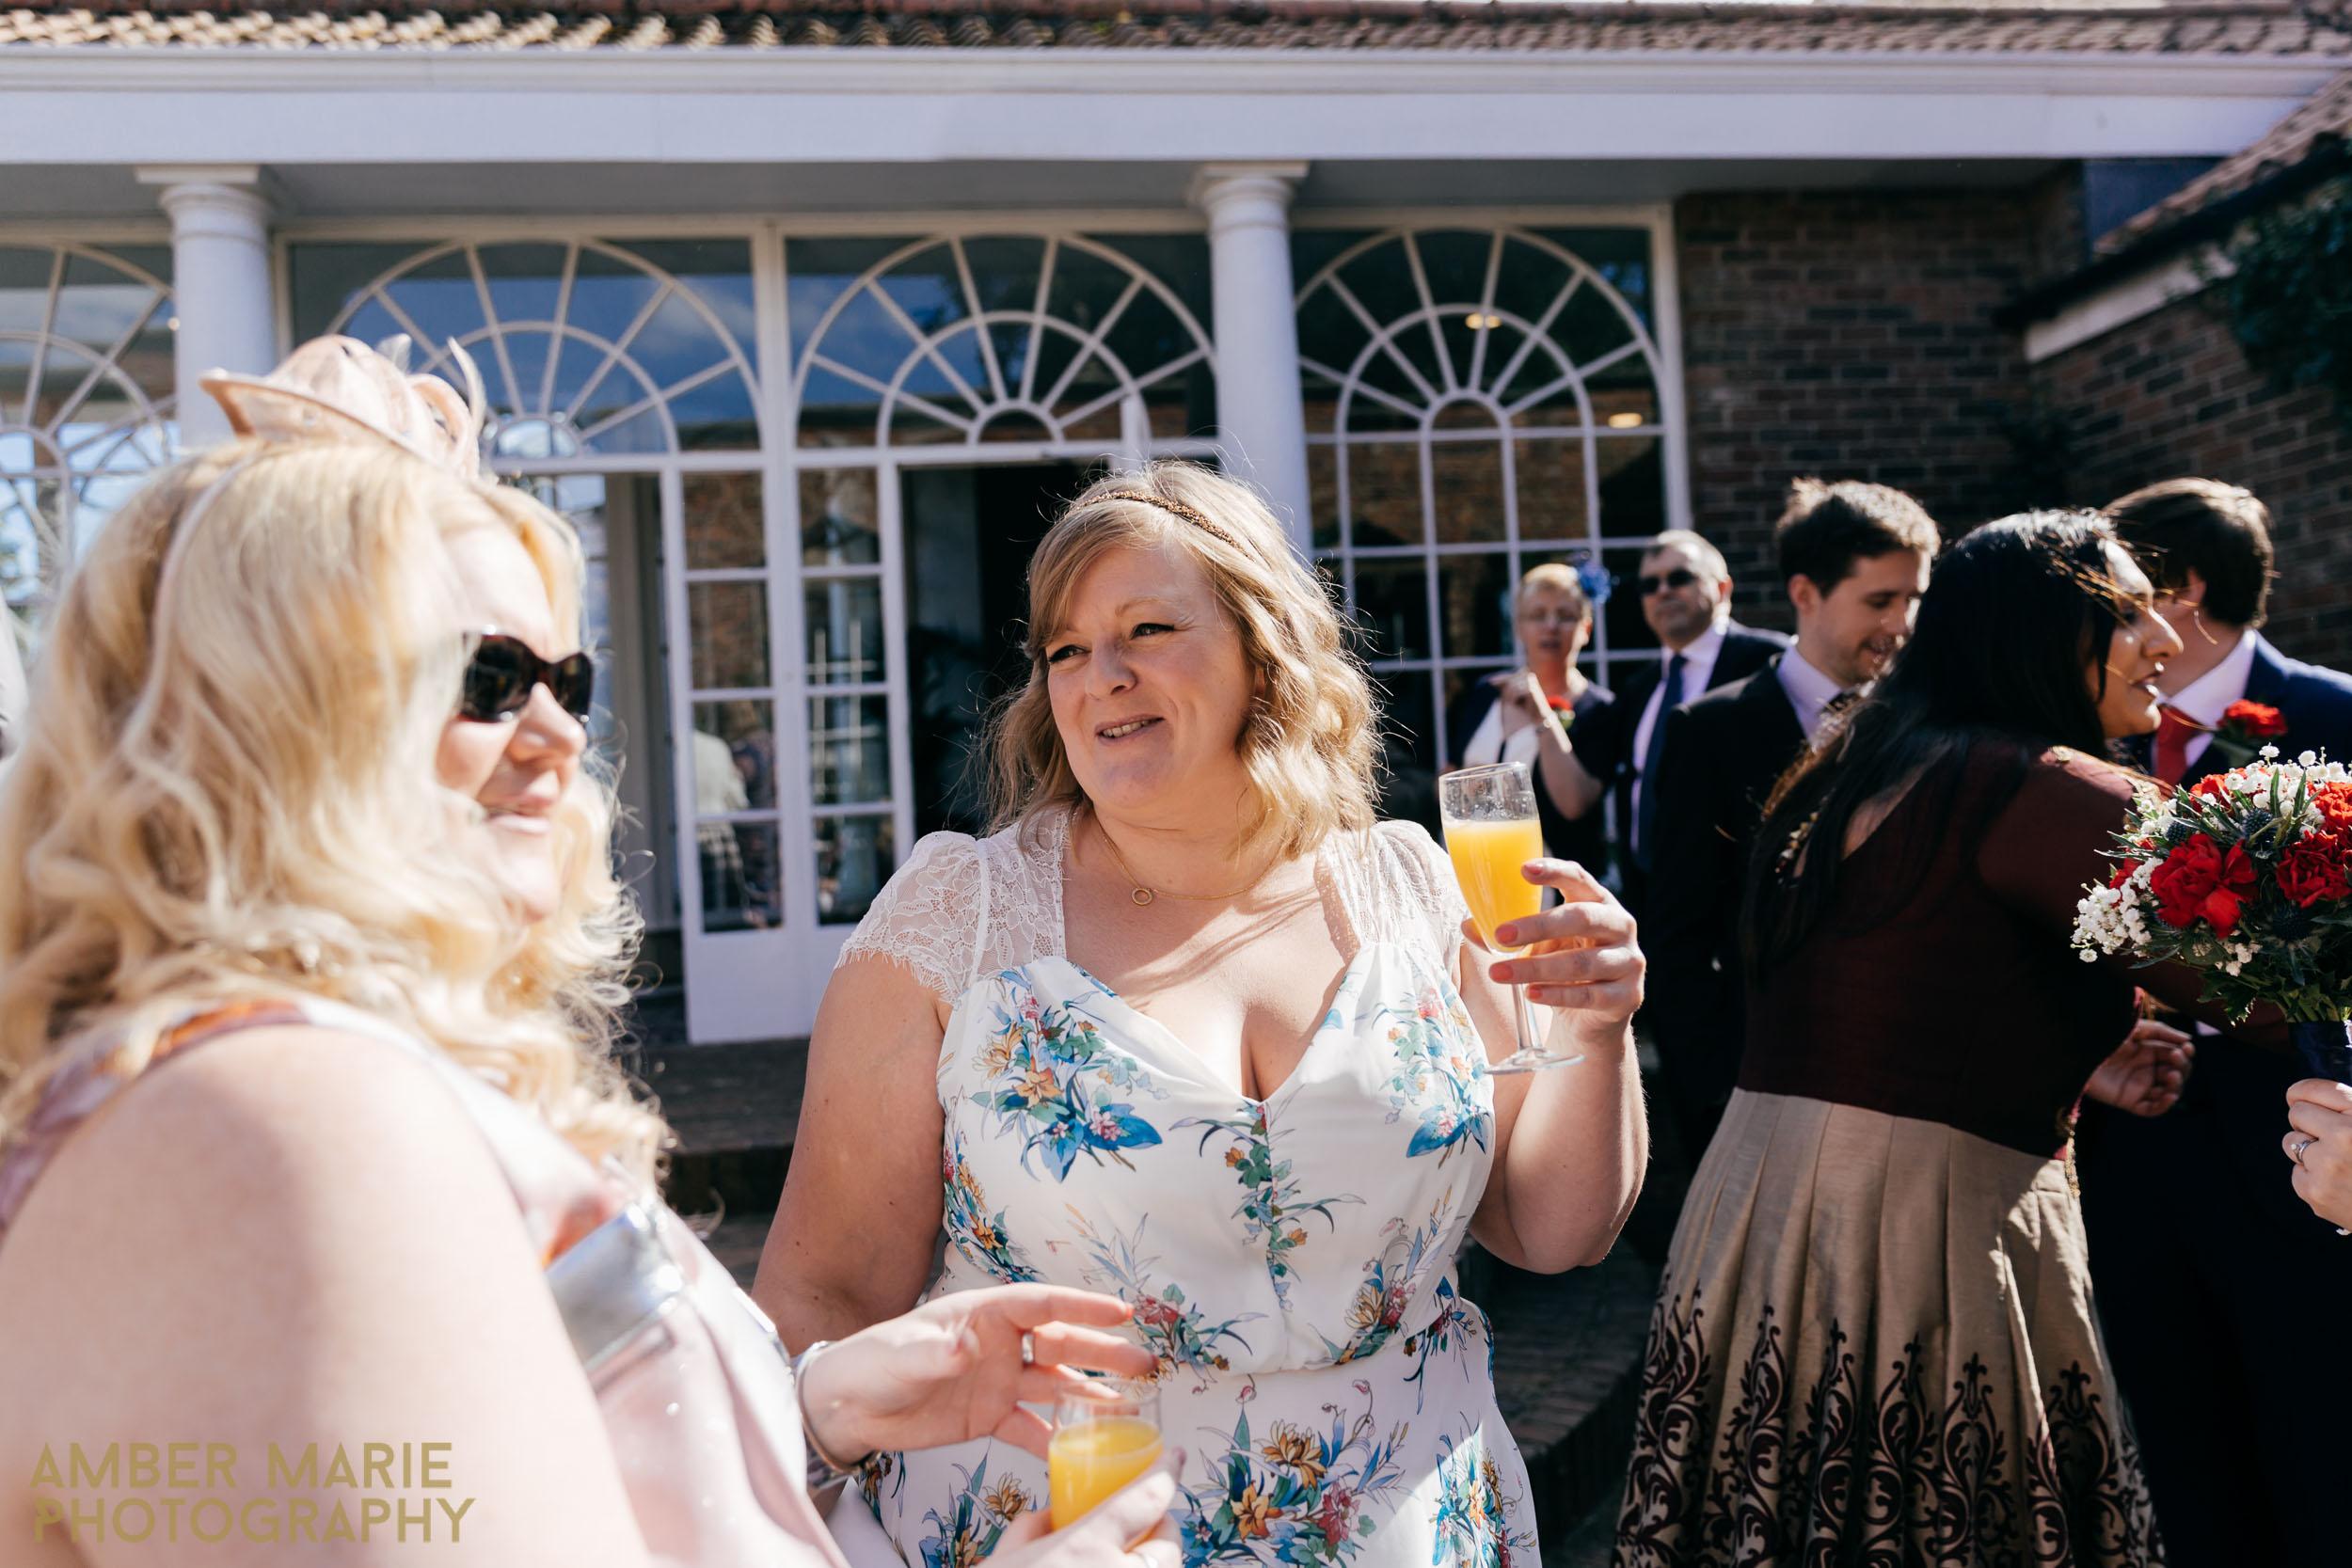 Eco friendly creative wedding photographers leeds yorkshire